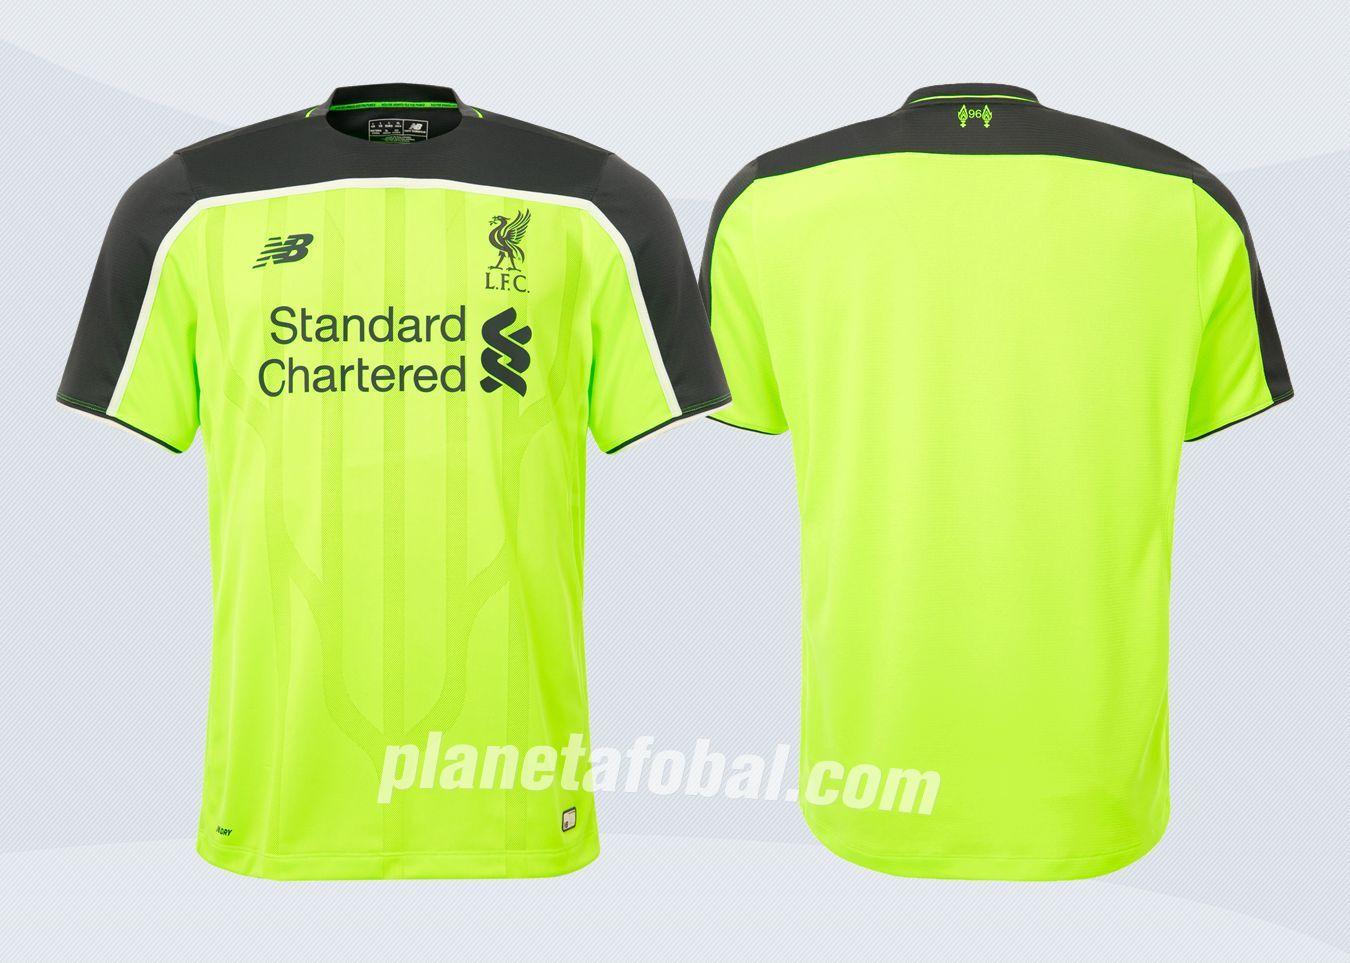 Tercera camiseta New Balance del Liverpool FC para 2016/2017 | Imágenes Tienda Oficial